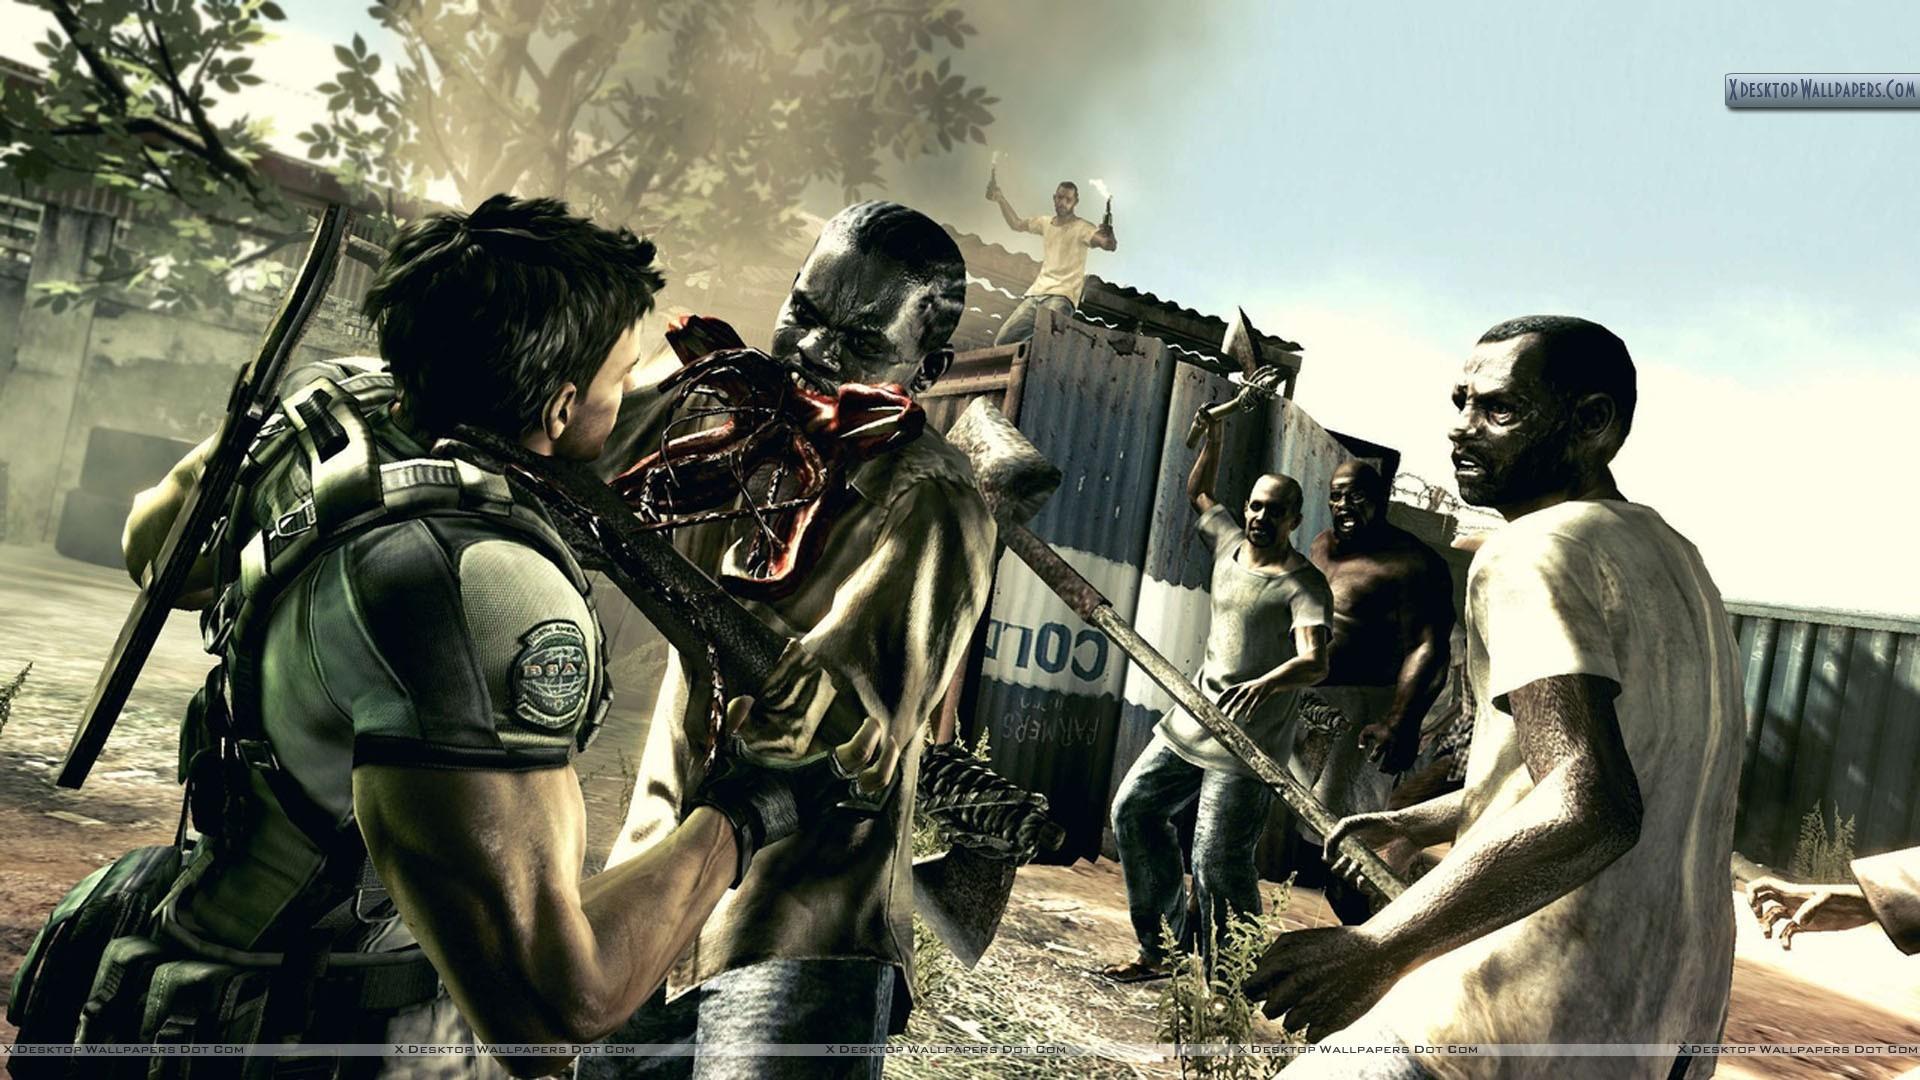 Resident Evil Wallpapers HD WallpaperPulse 1920×1080